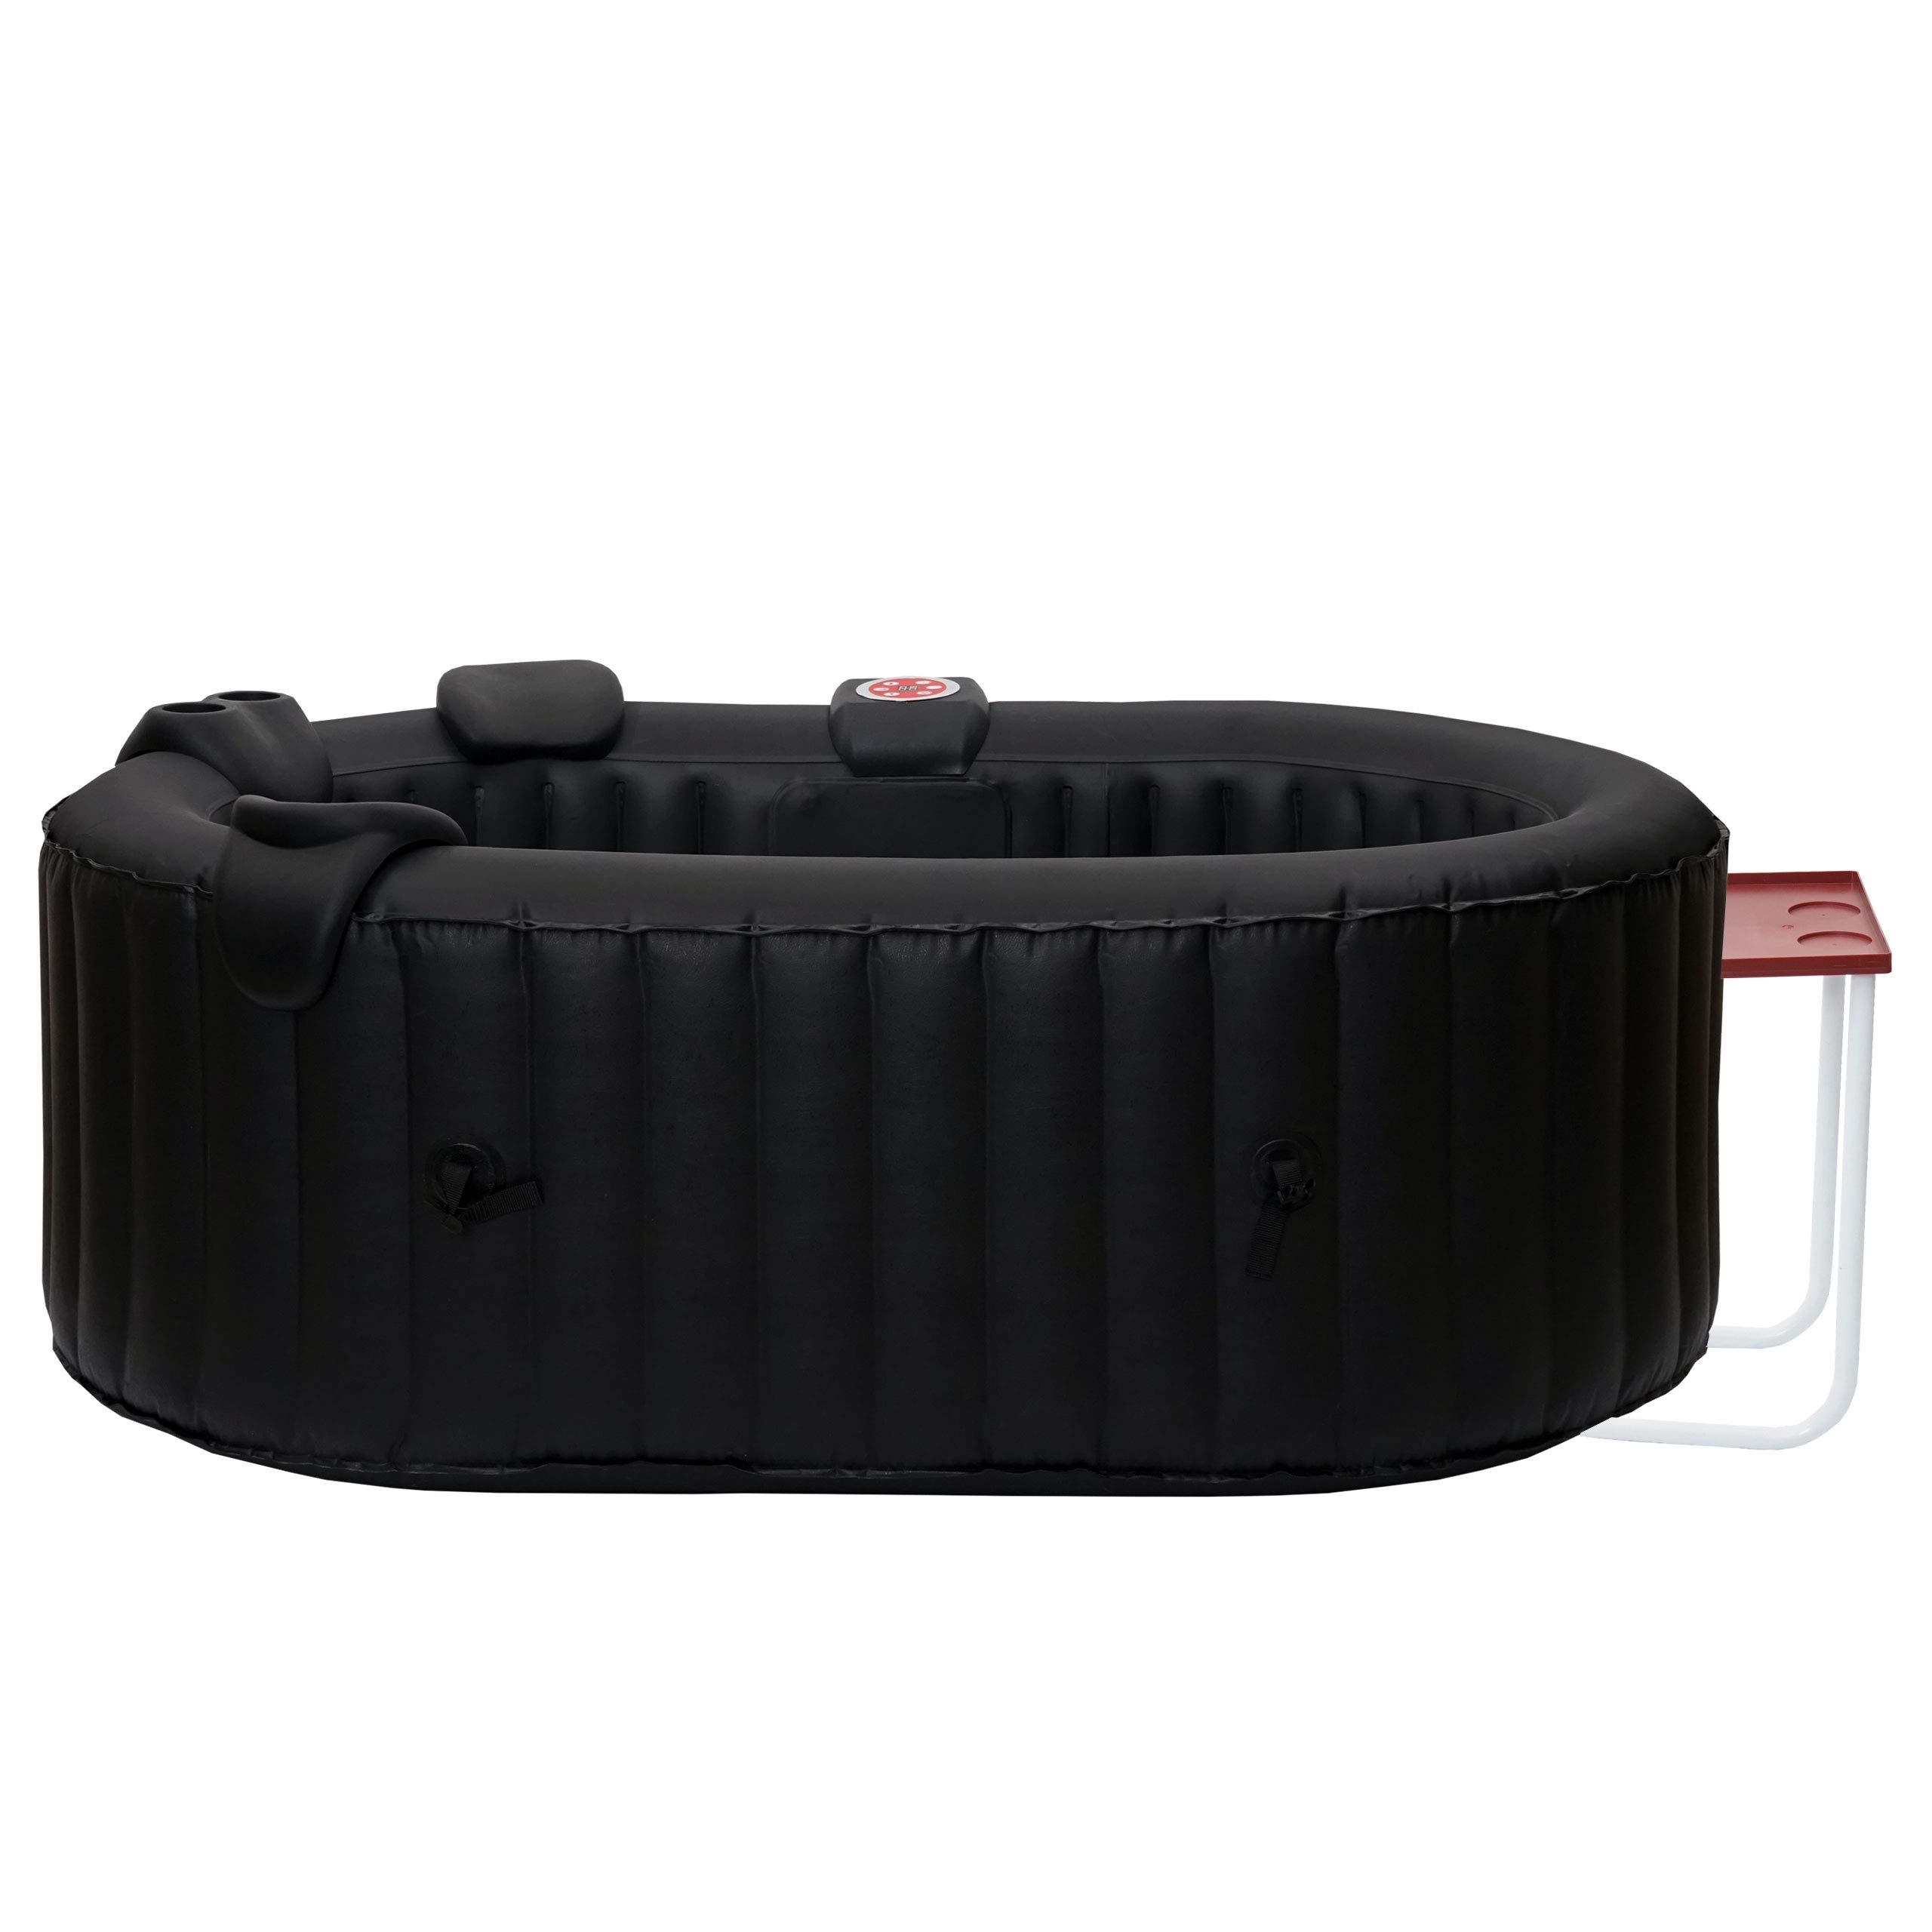 Full Size of Mendler Whirlpool Hwc E32 Aufblasbar Wohnzimmer Whirlpool Aufblasbar